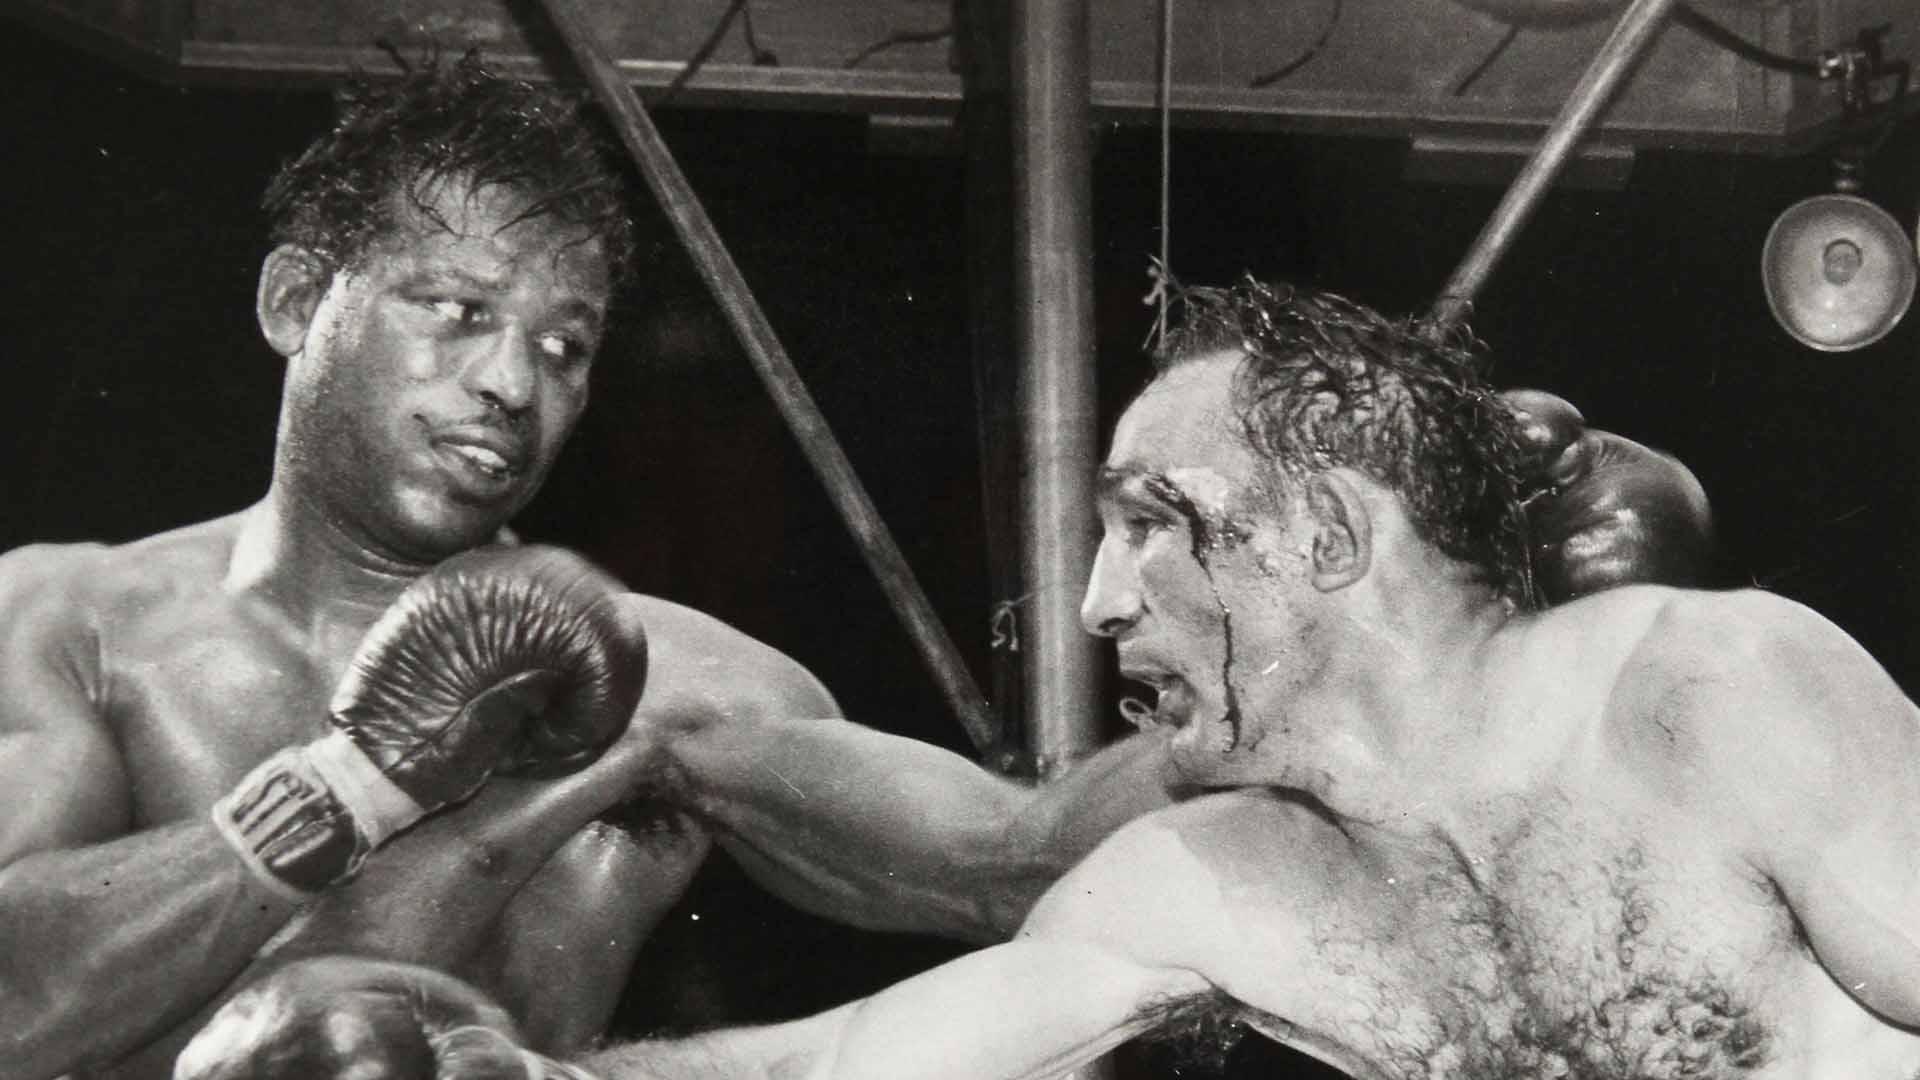 melhores lutas de boxe Sugar Ray Robinson x Carmen Basilio